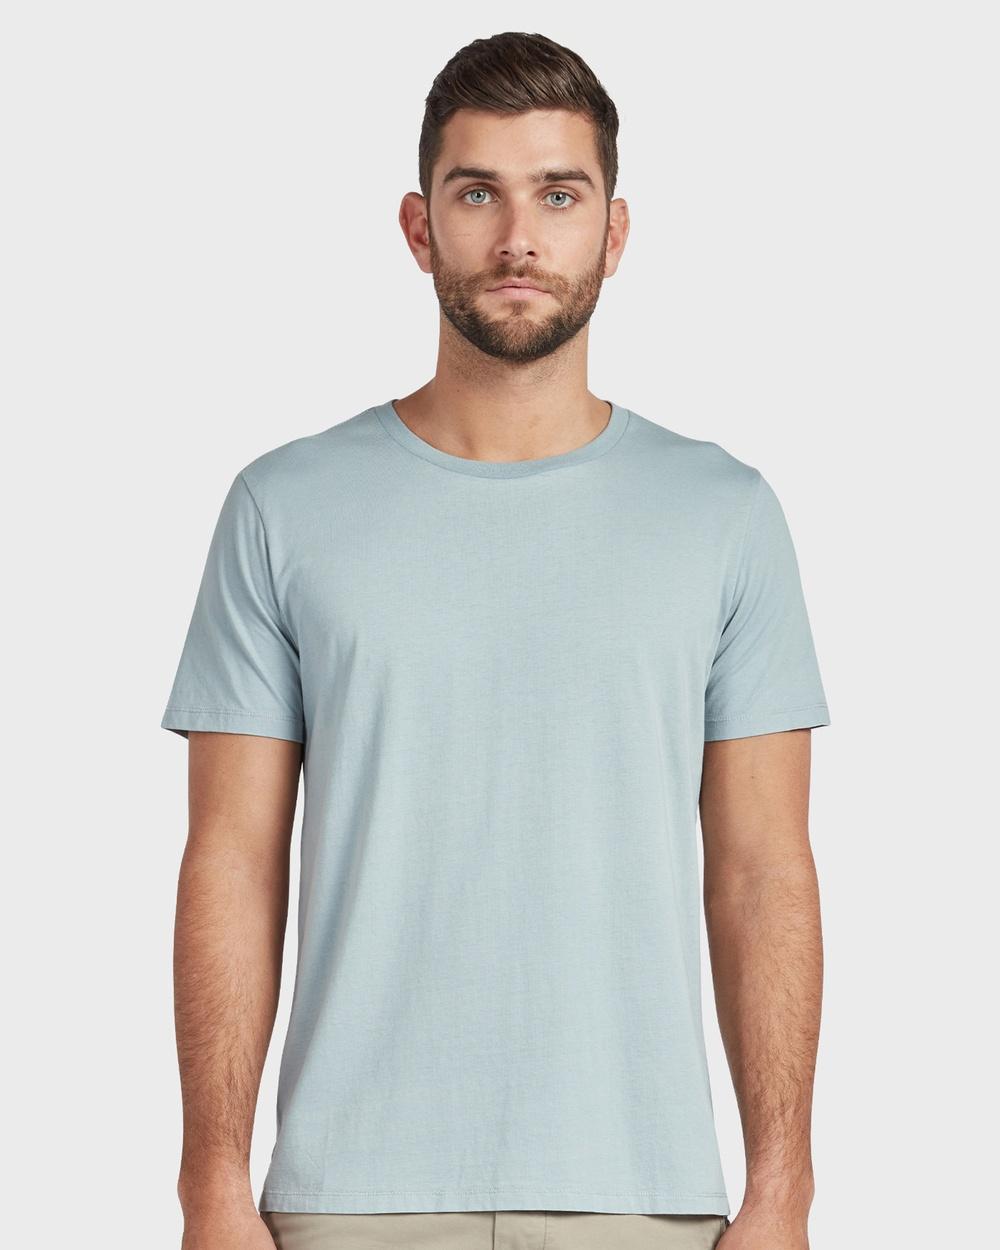 Academy Brand Blizzard Wash Tee Shirts & Polos Blue